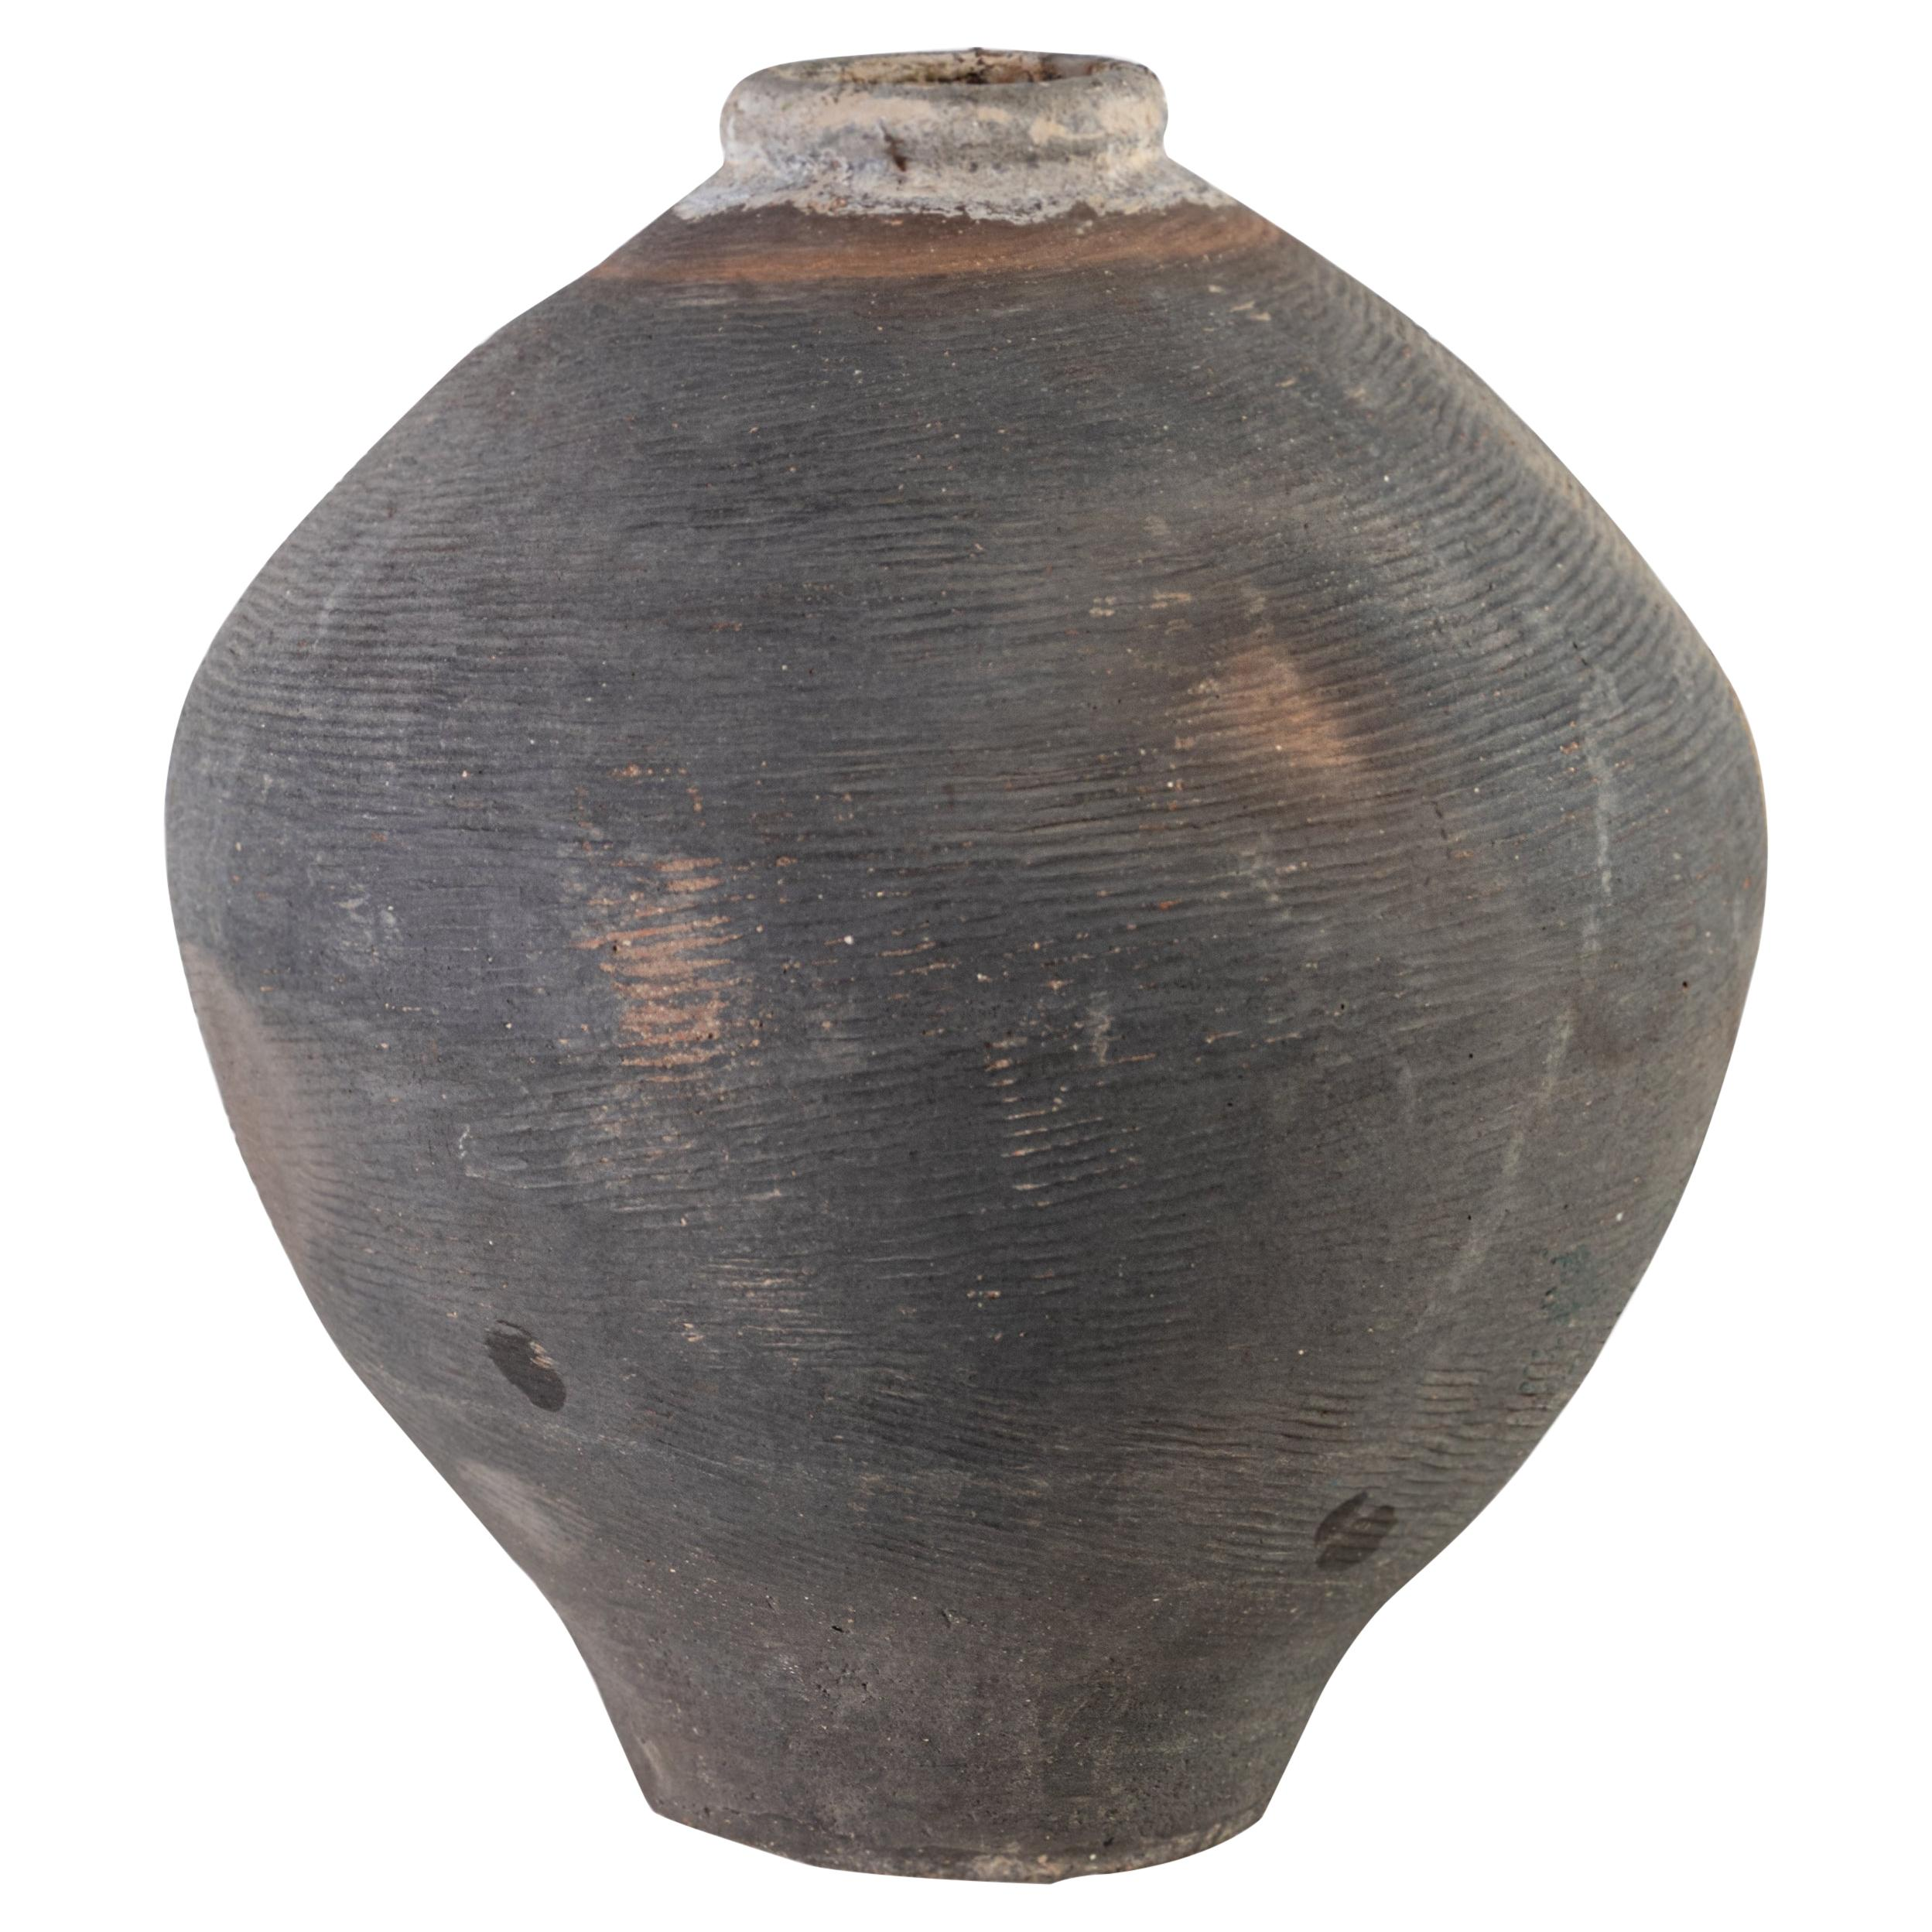 Vintage Southern Asia Terracotta Storage Jar